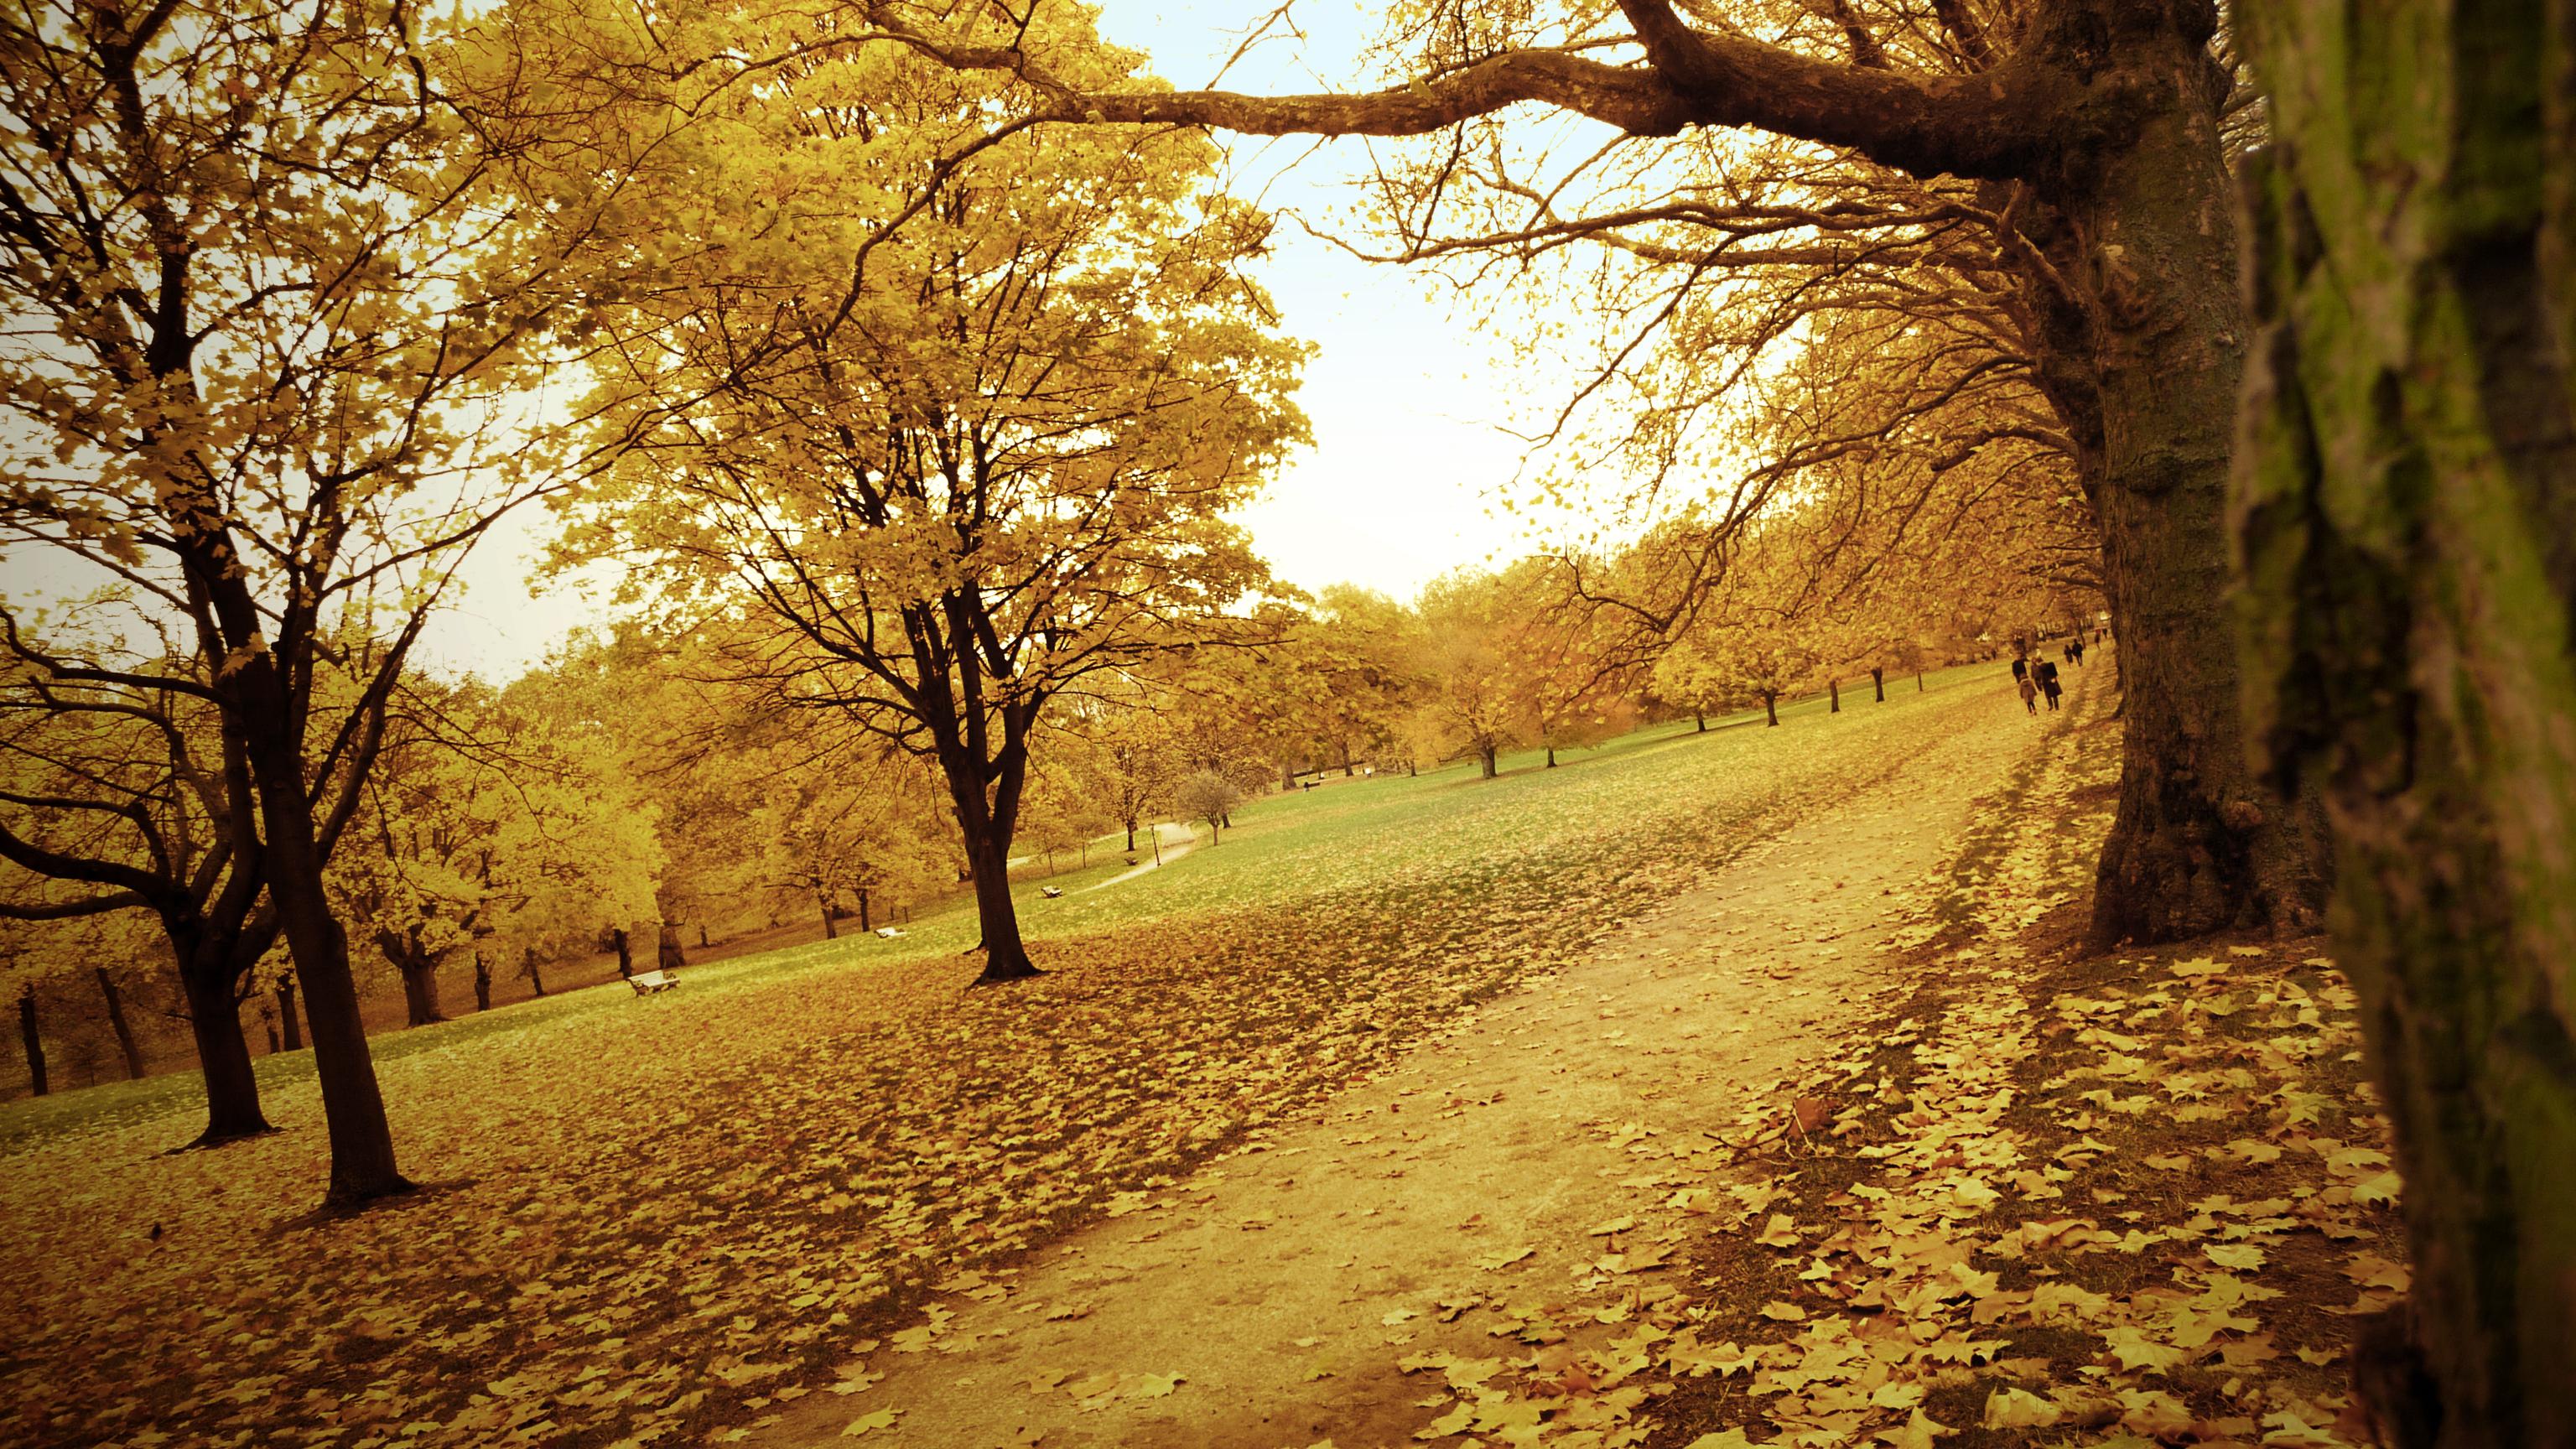 Осення дорожка лесу загрузить